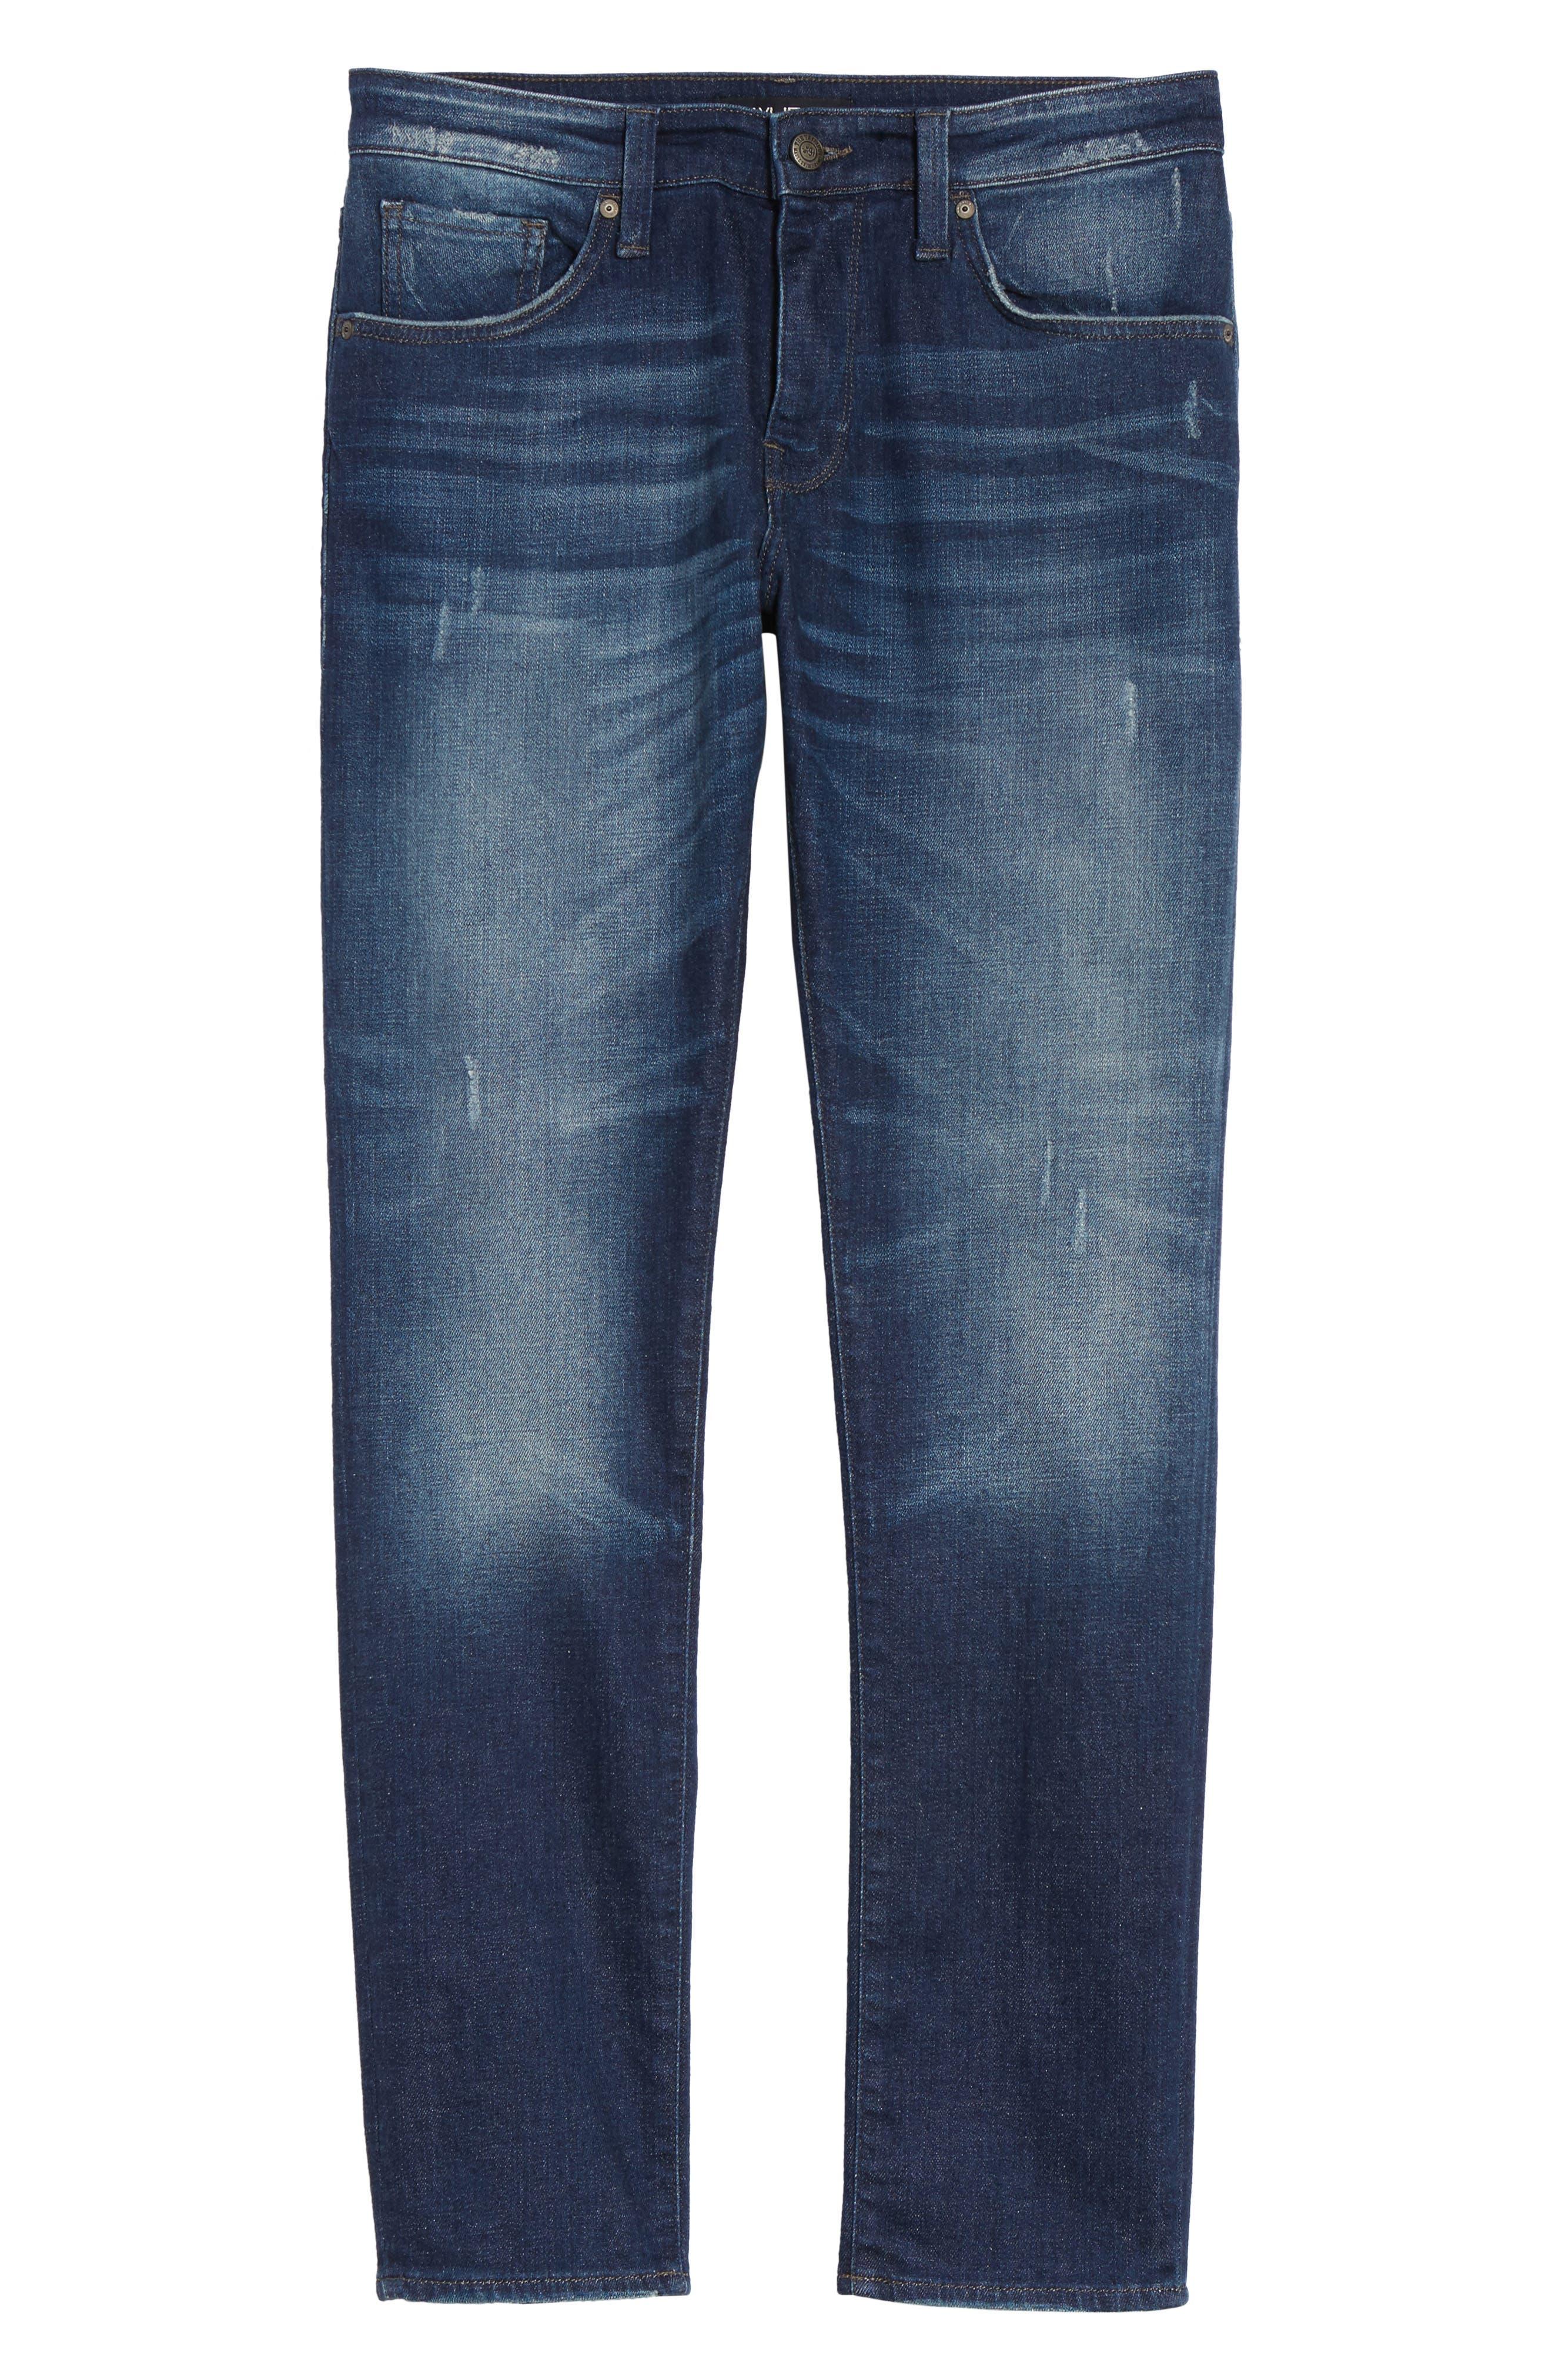 Jake Easy Slim Fit Jeans,                             Alternate thumbnail 6, color,                             401